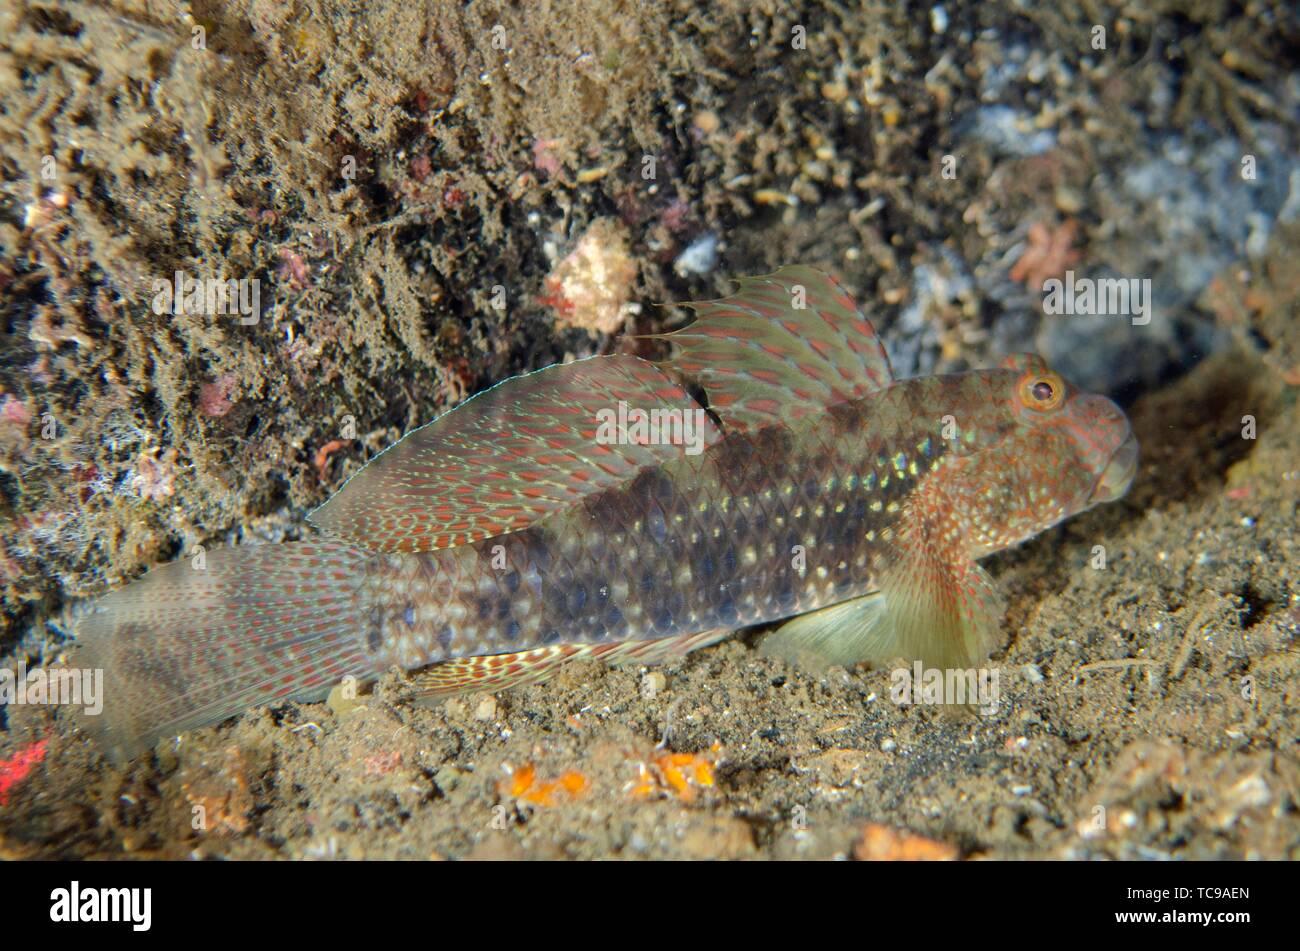 Beautiful Goby (Exyrias bellismus), Banda Neira Jetty dive site, Ambon, Maluku (Moluccas), Indonesia. - Stock Image